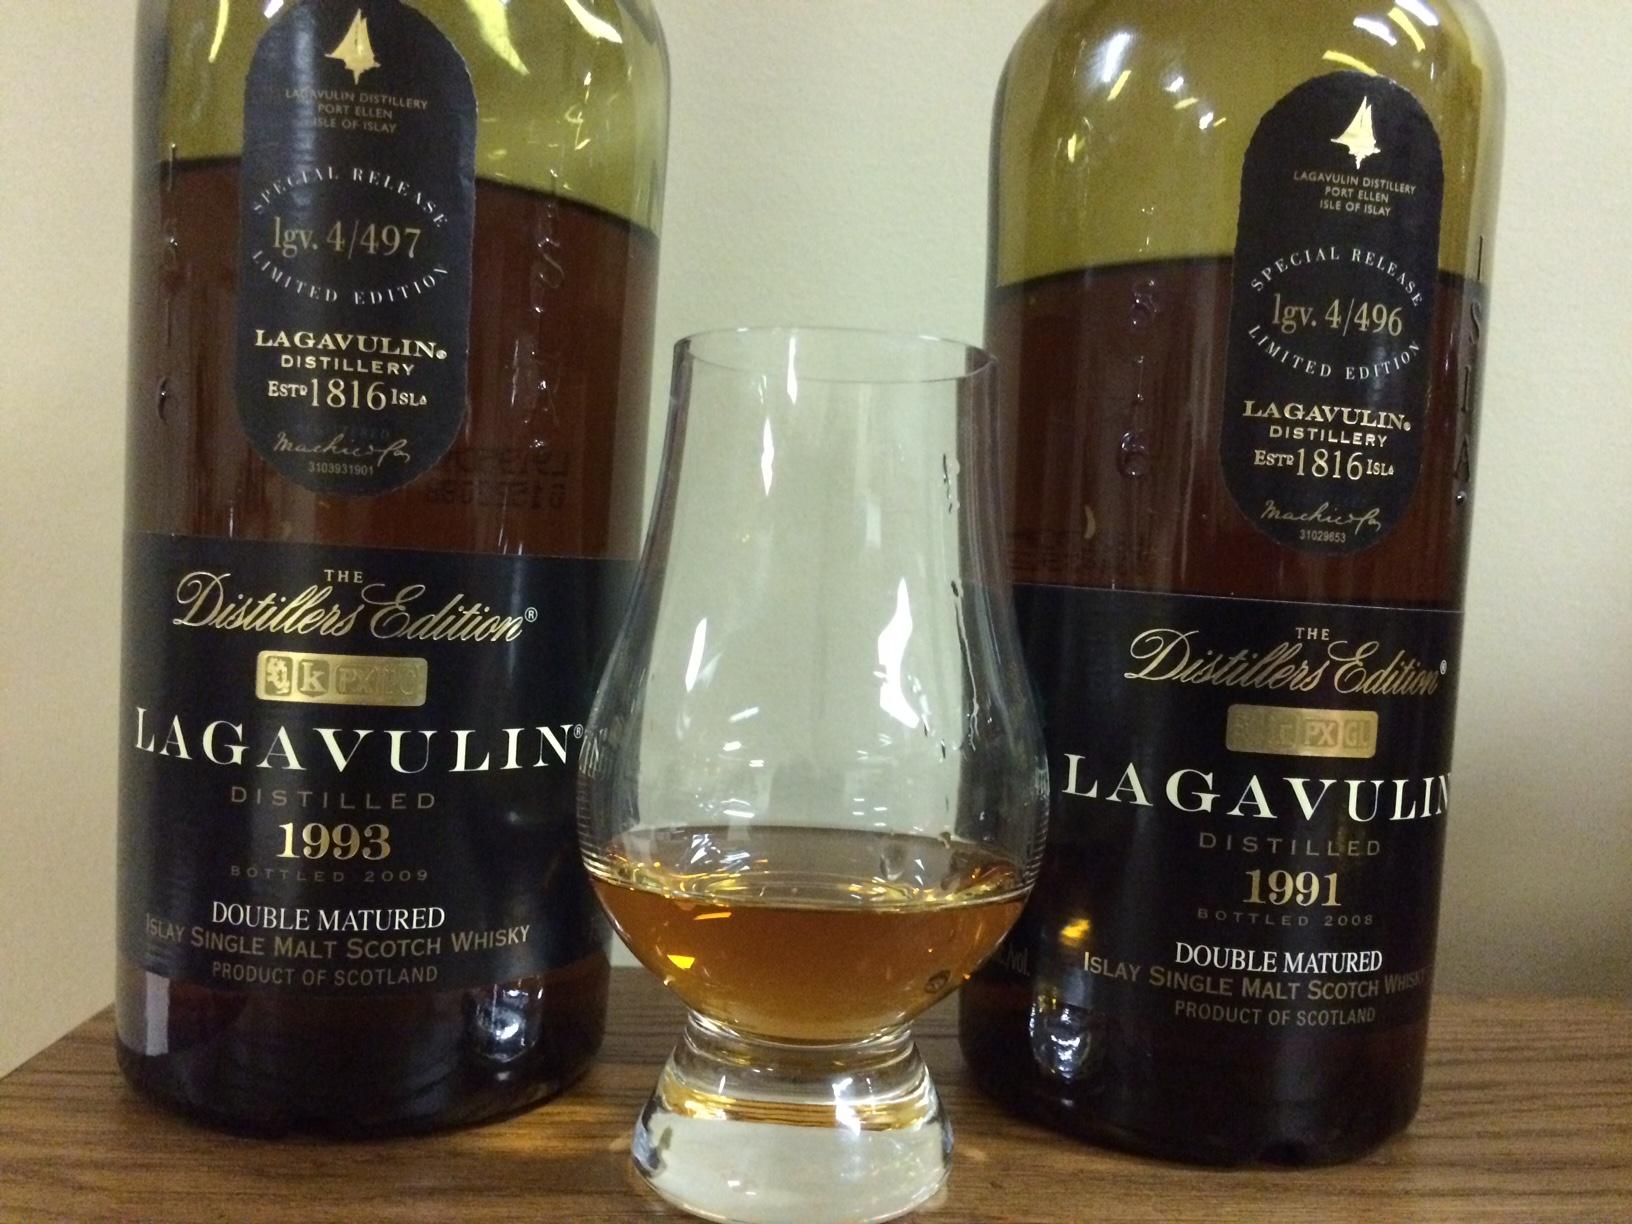 Lagavulin double matured 1993